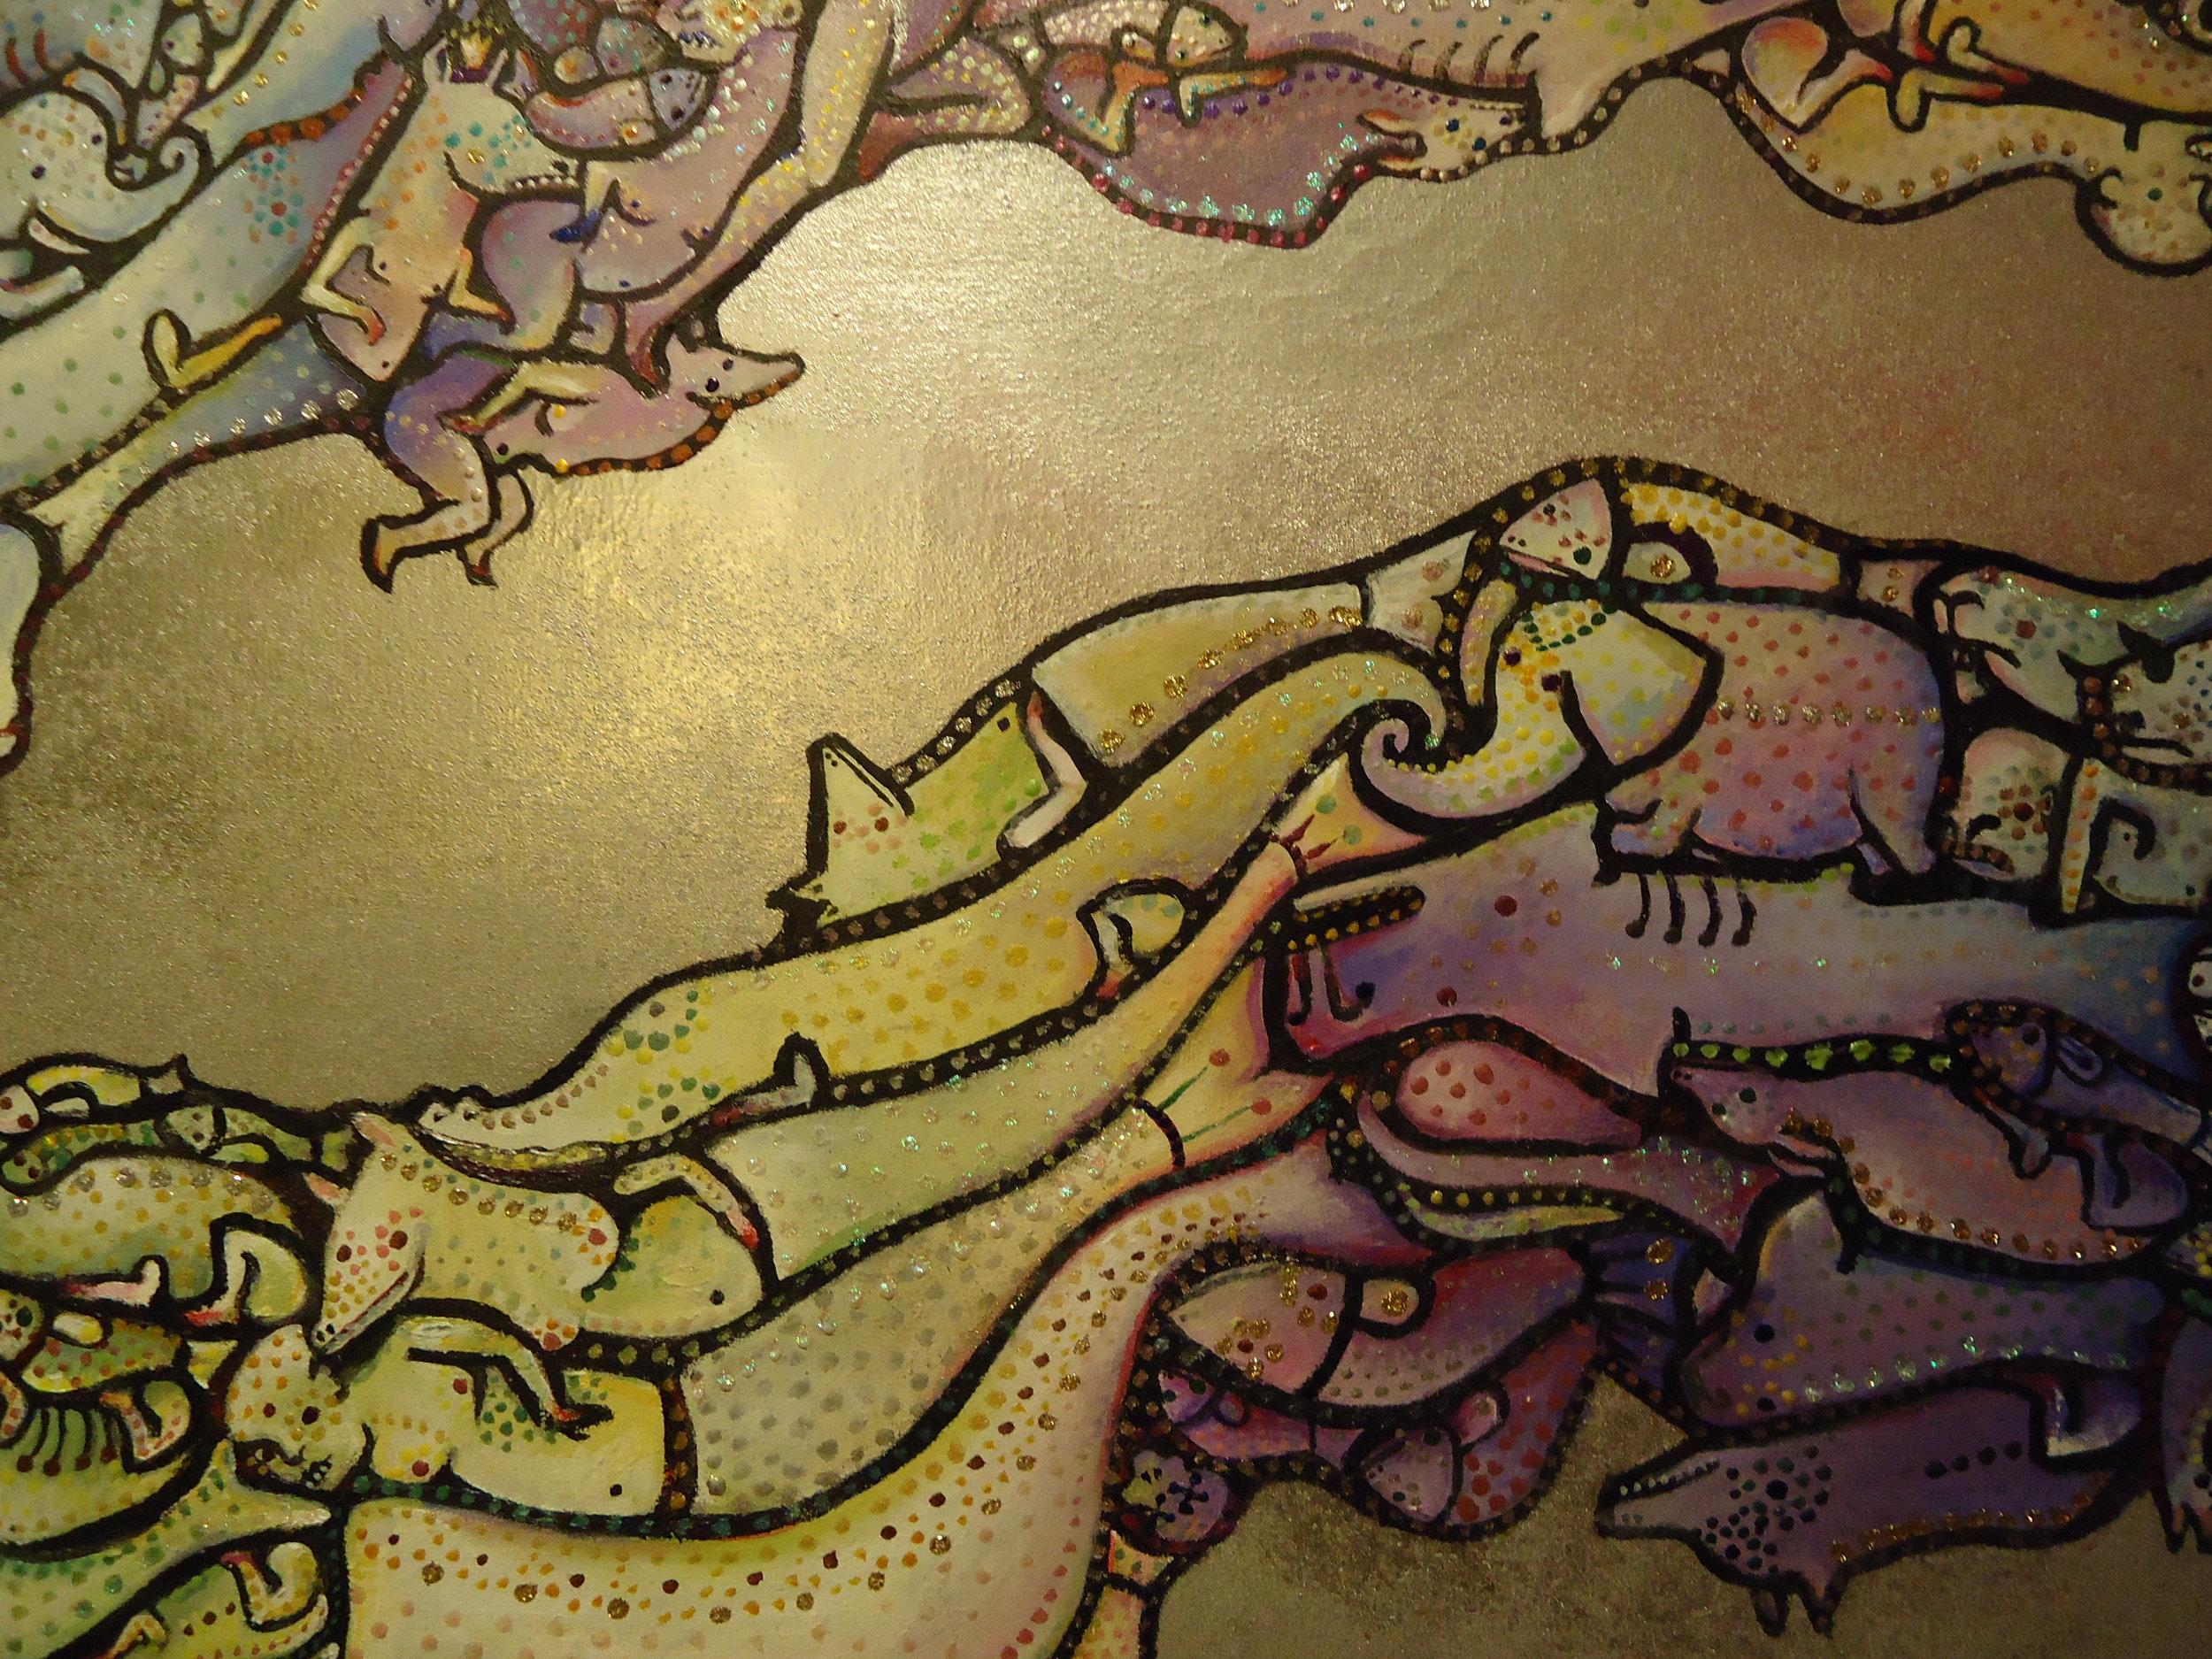 modern-art-painting-2013-oregon.jpg